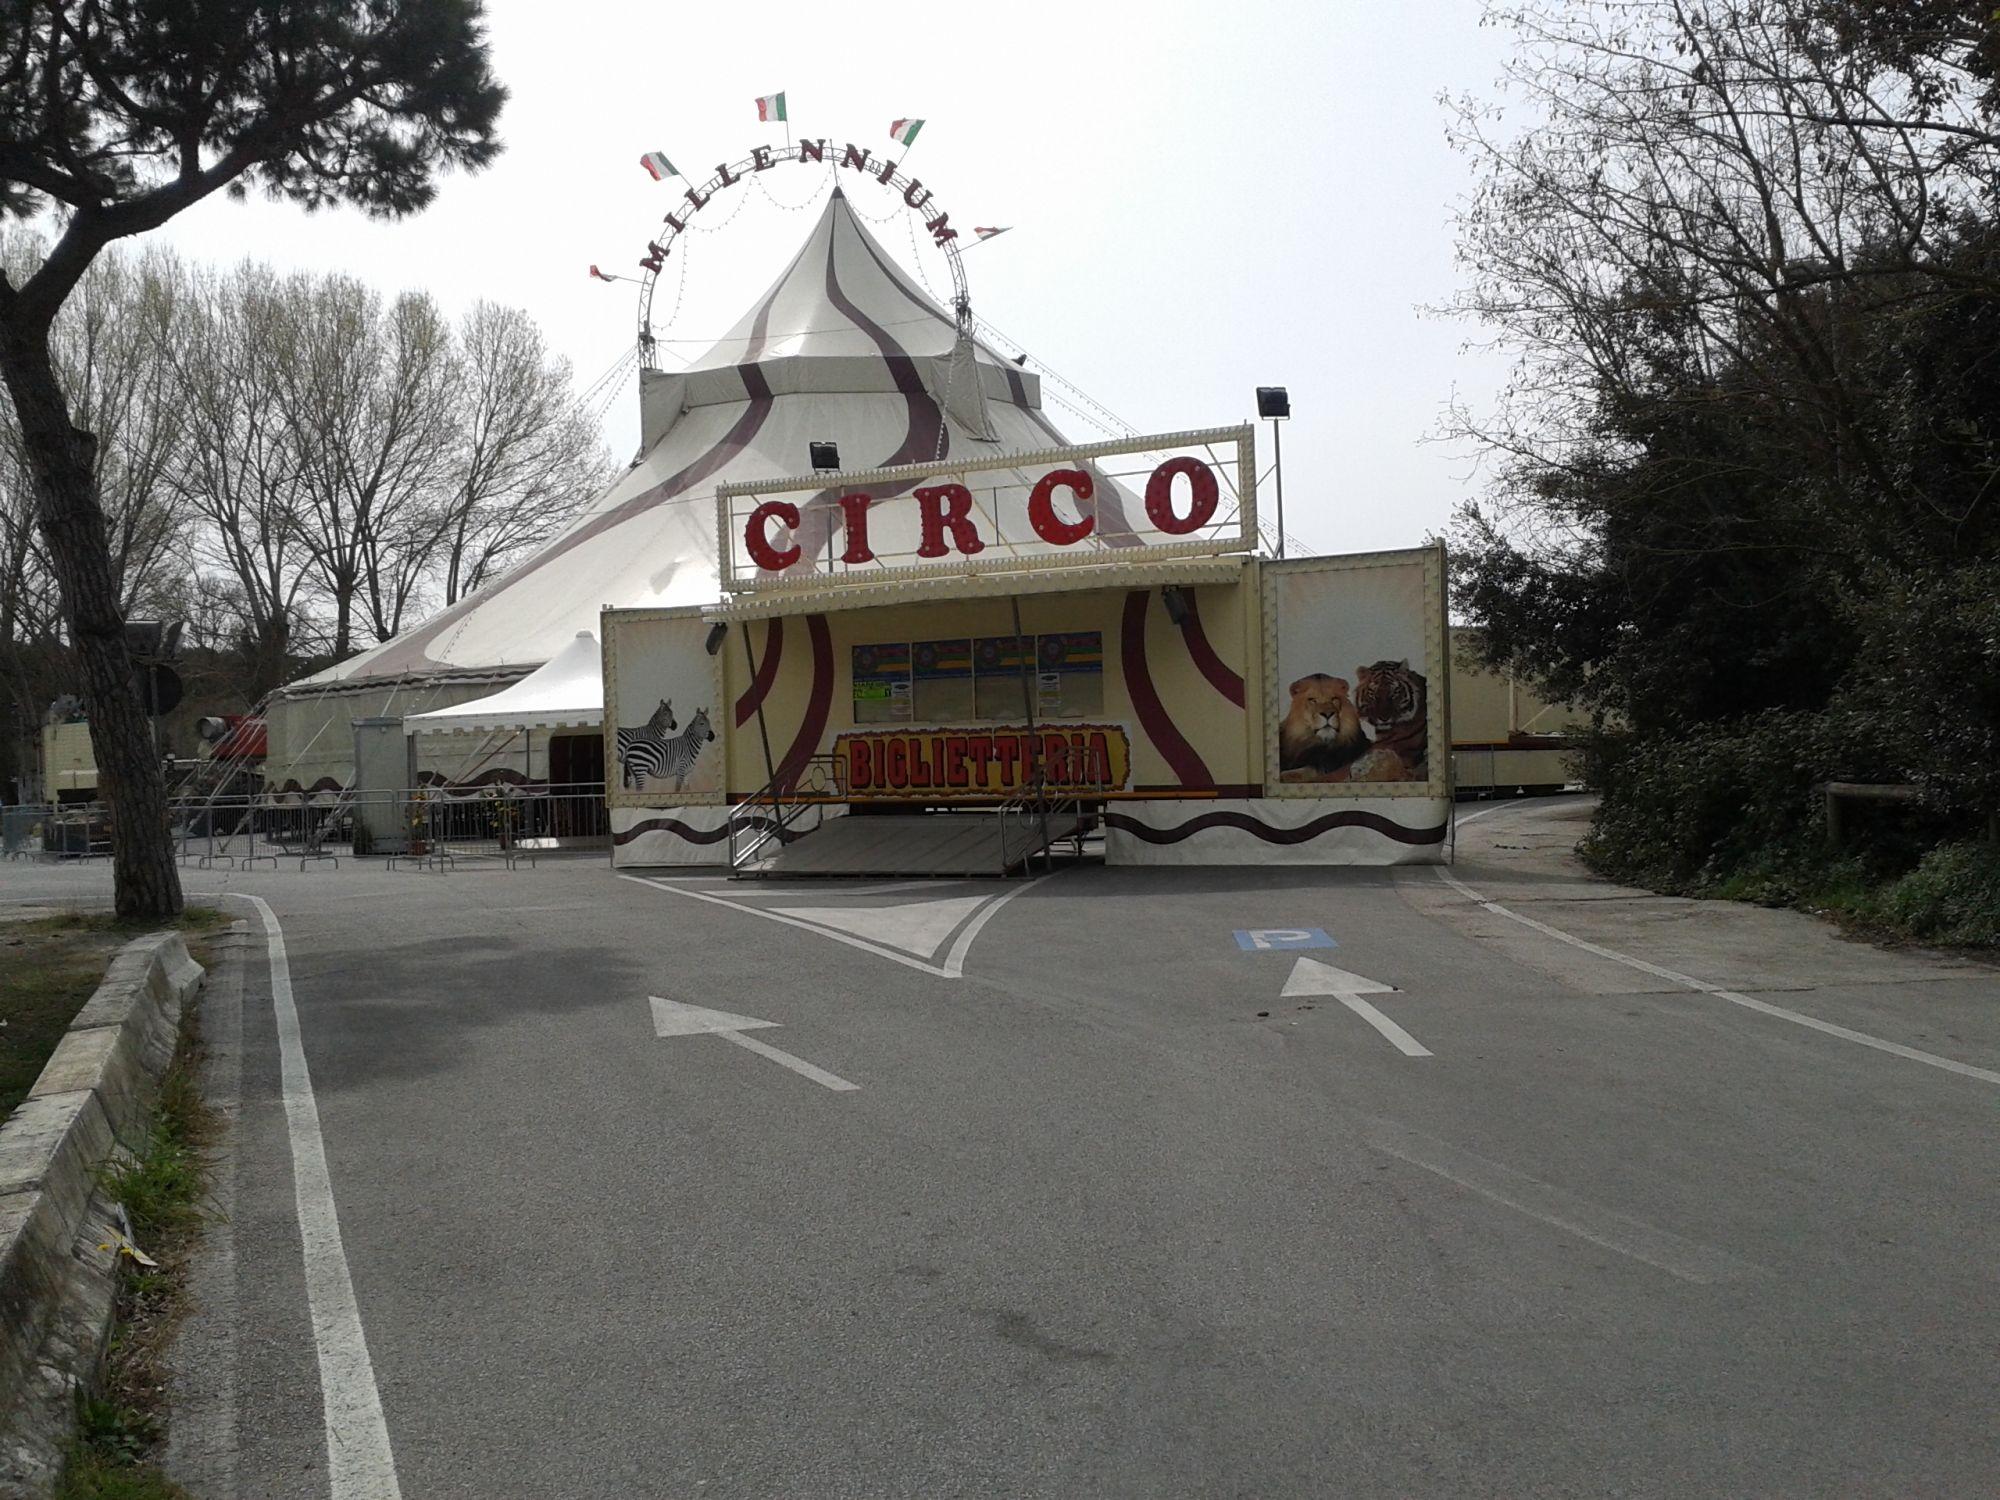 Niente più animali al circo